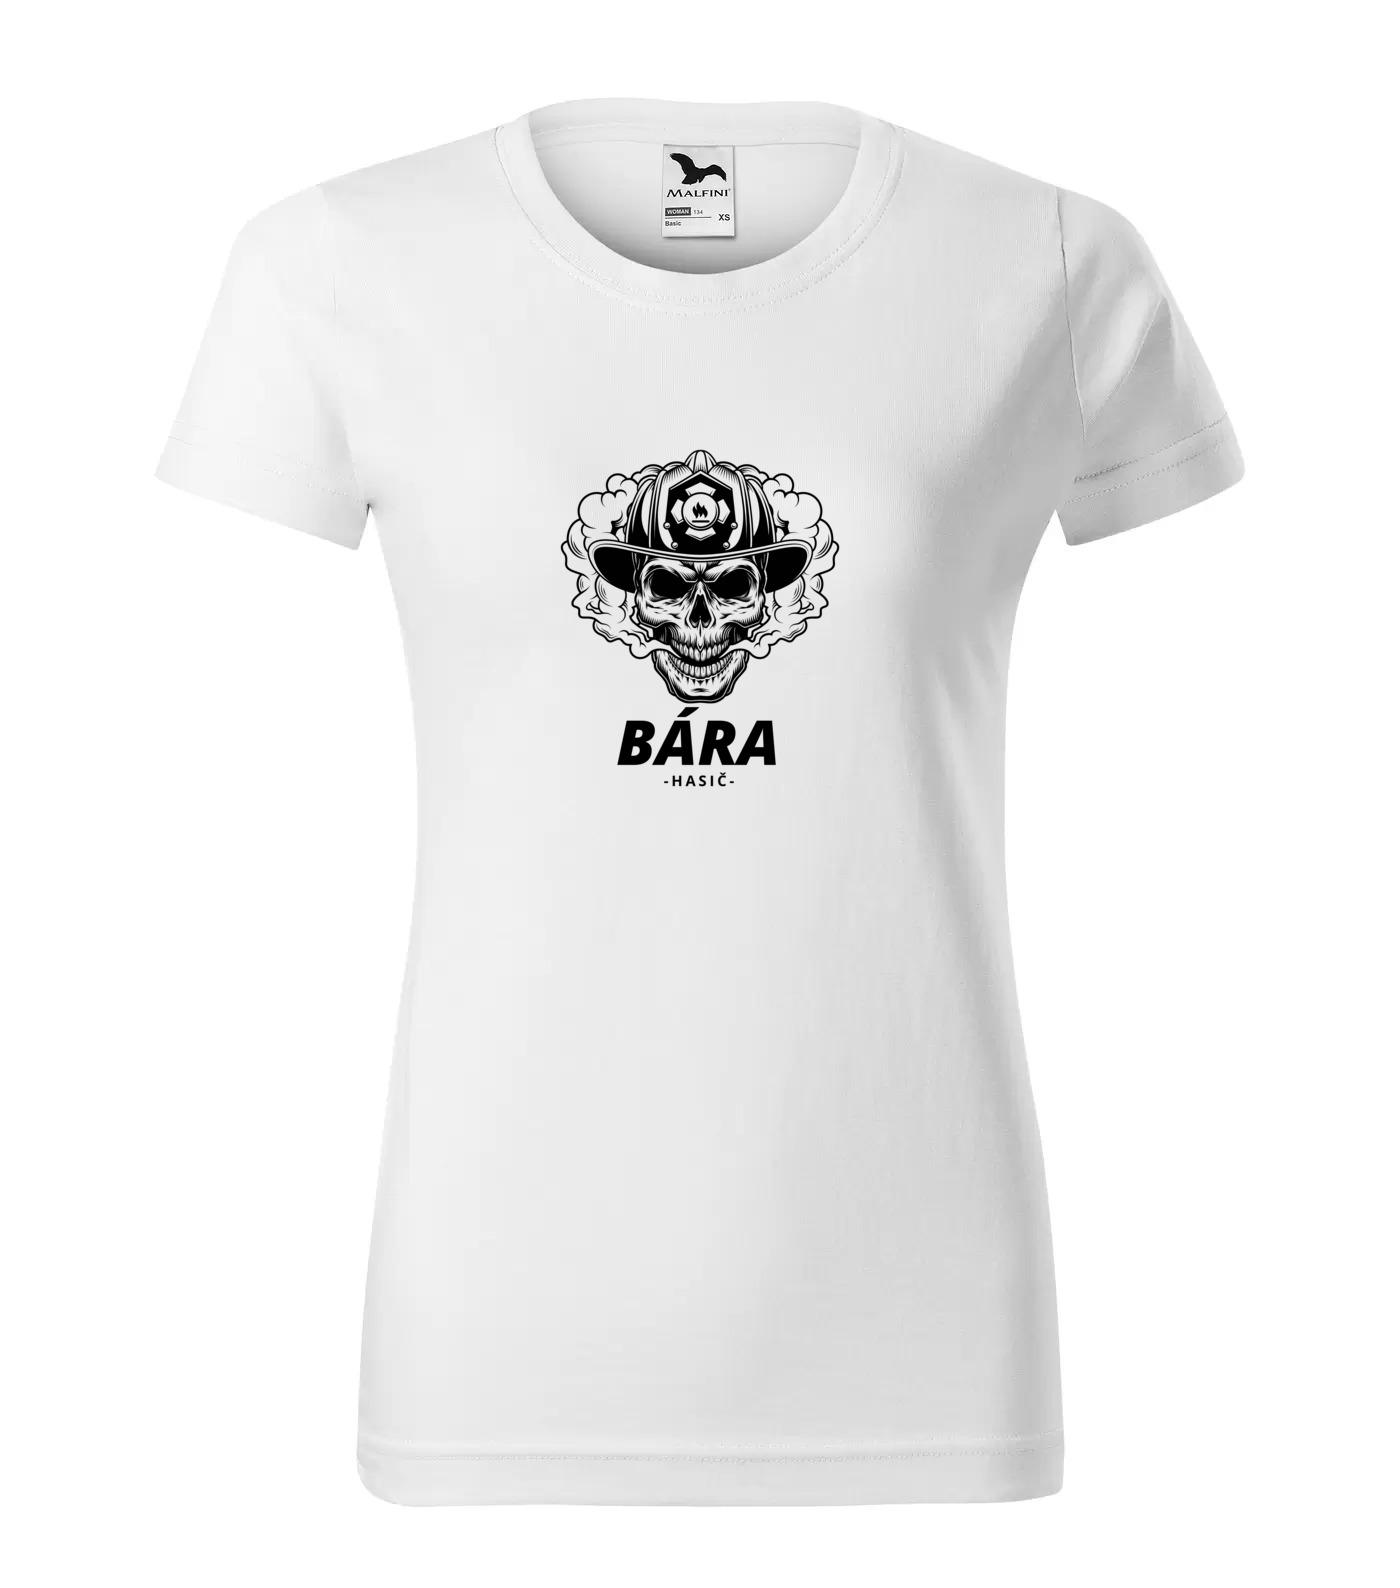 Tričko Hasič Bára